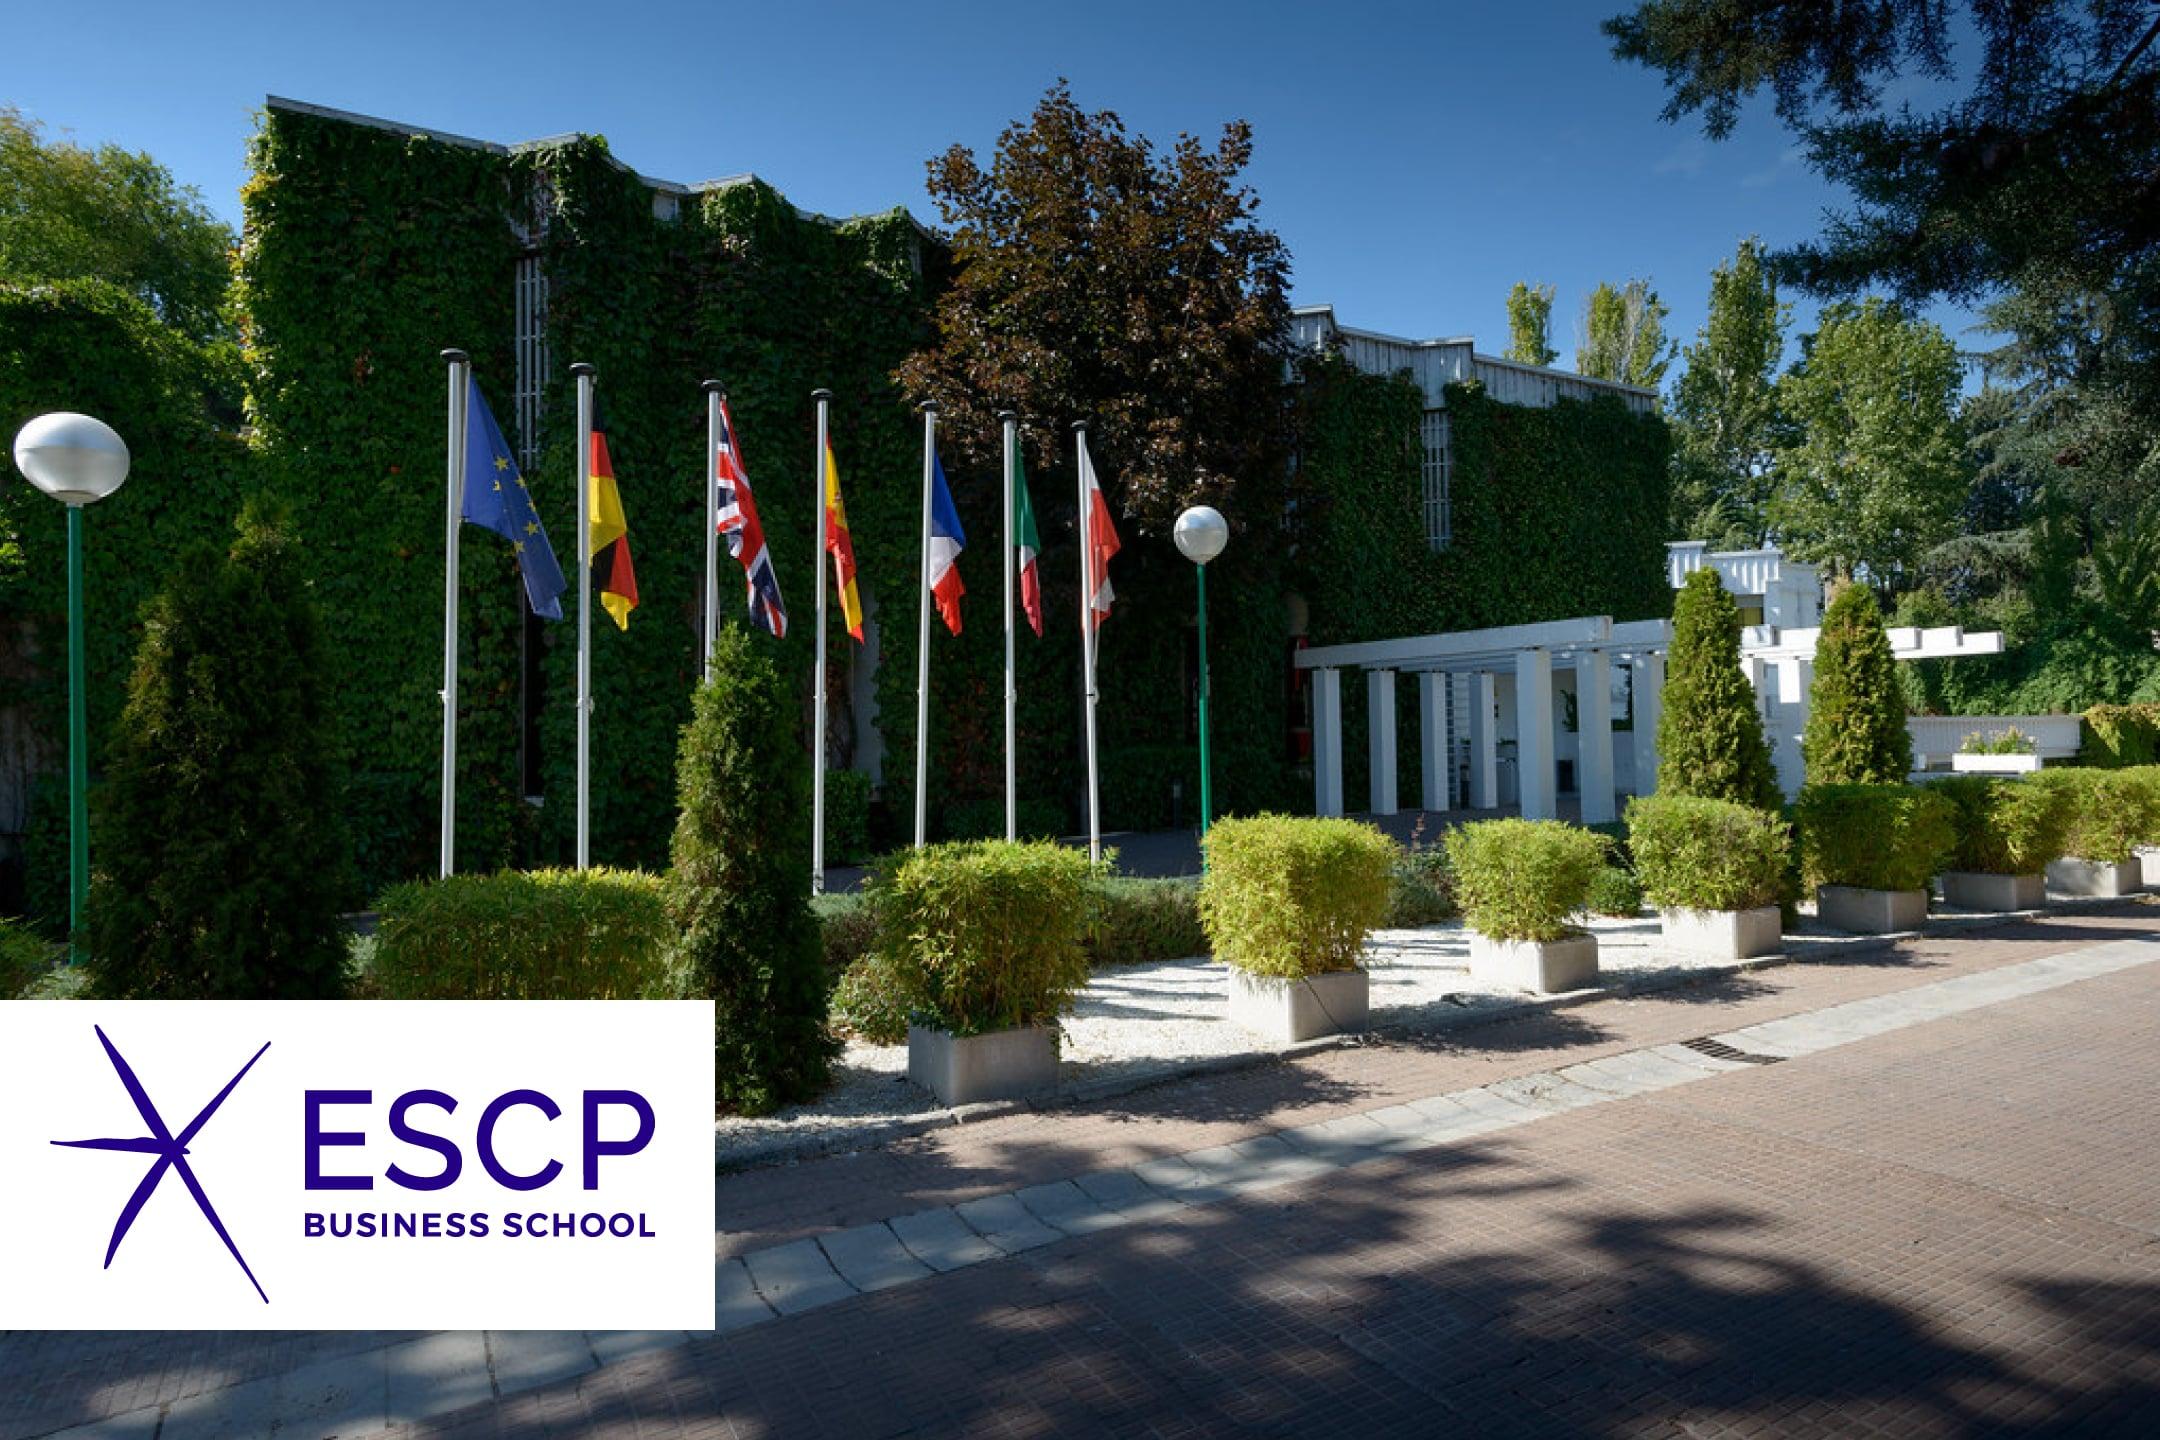 escp-business-school-blog